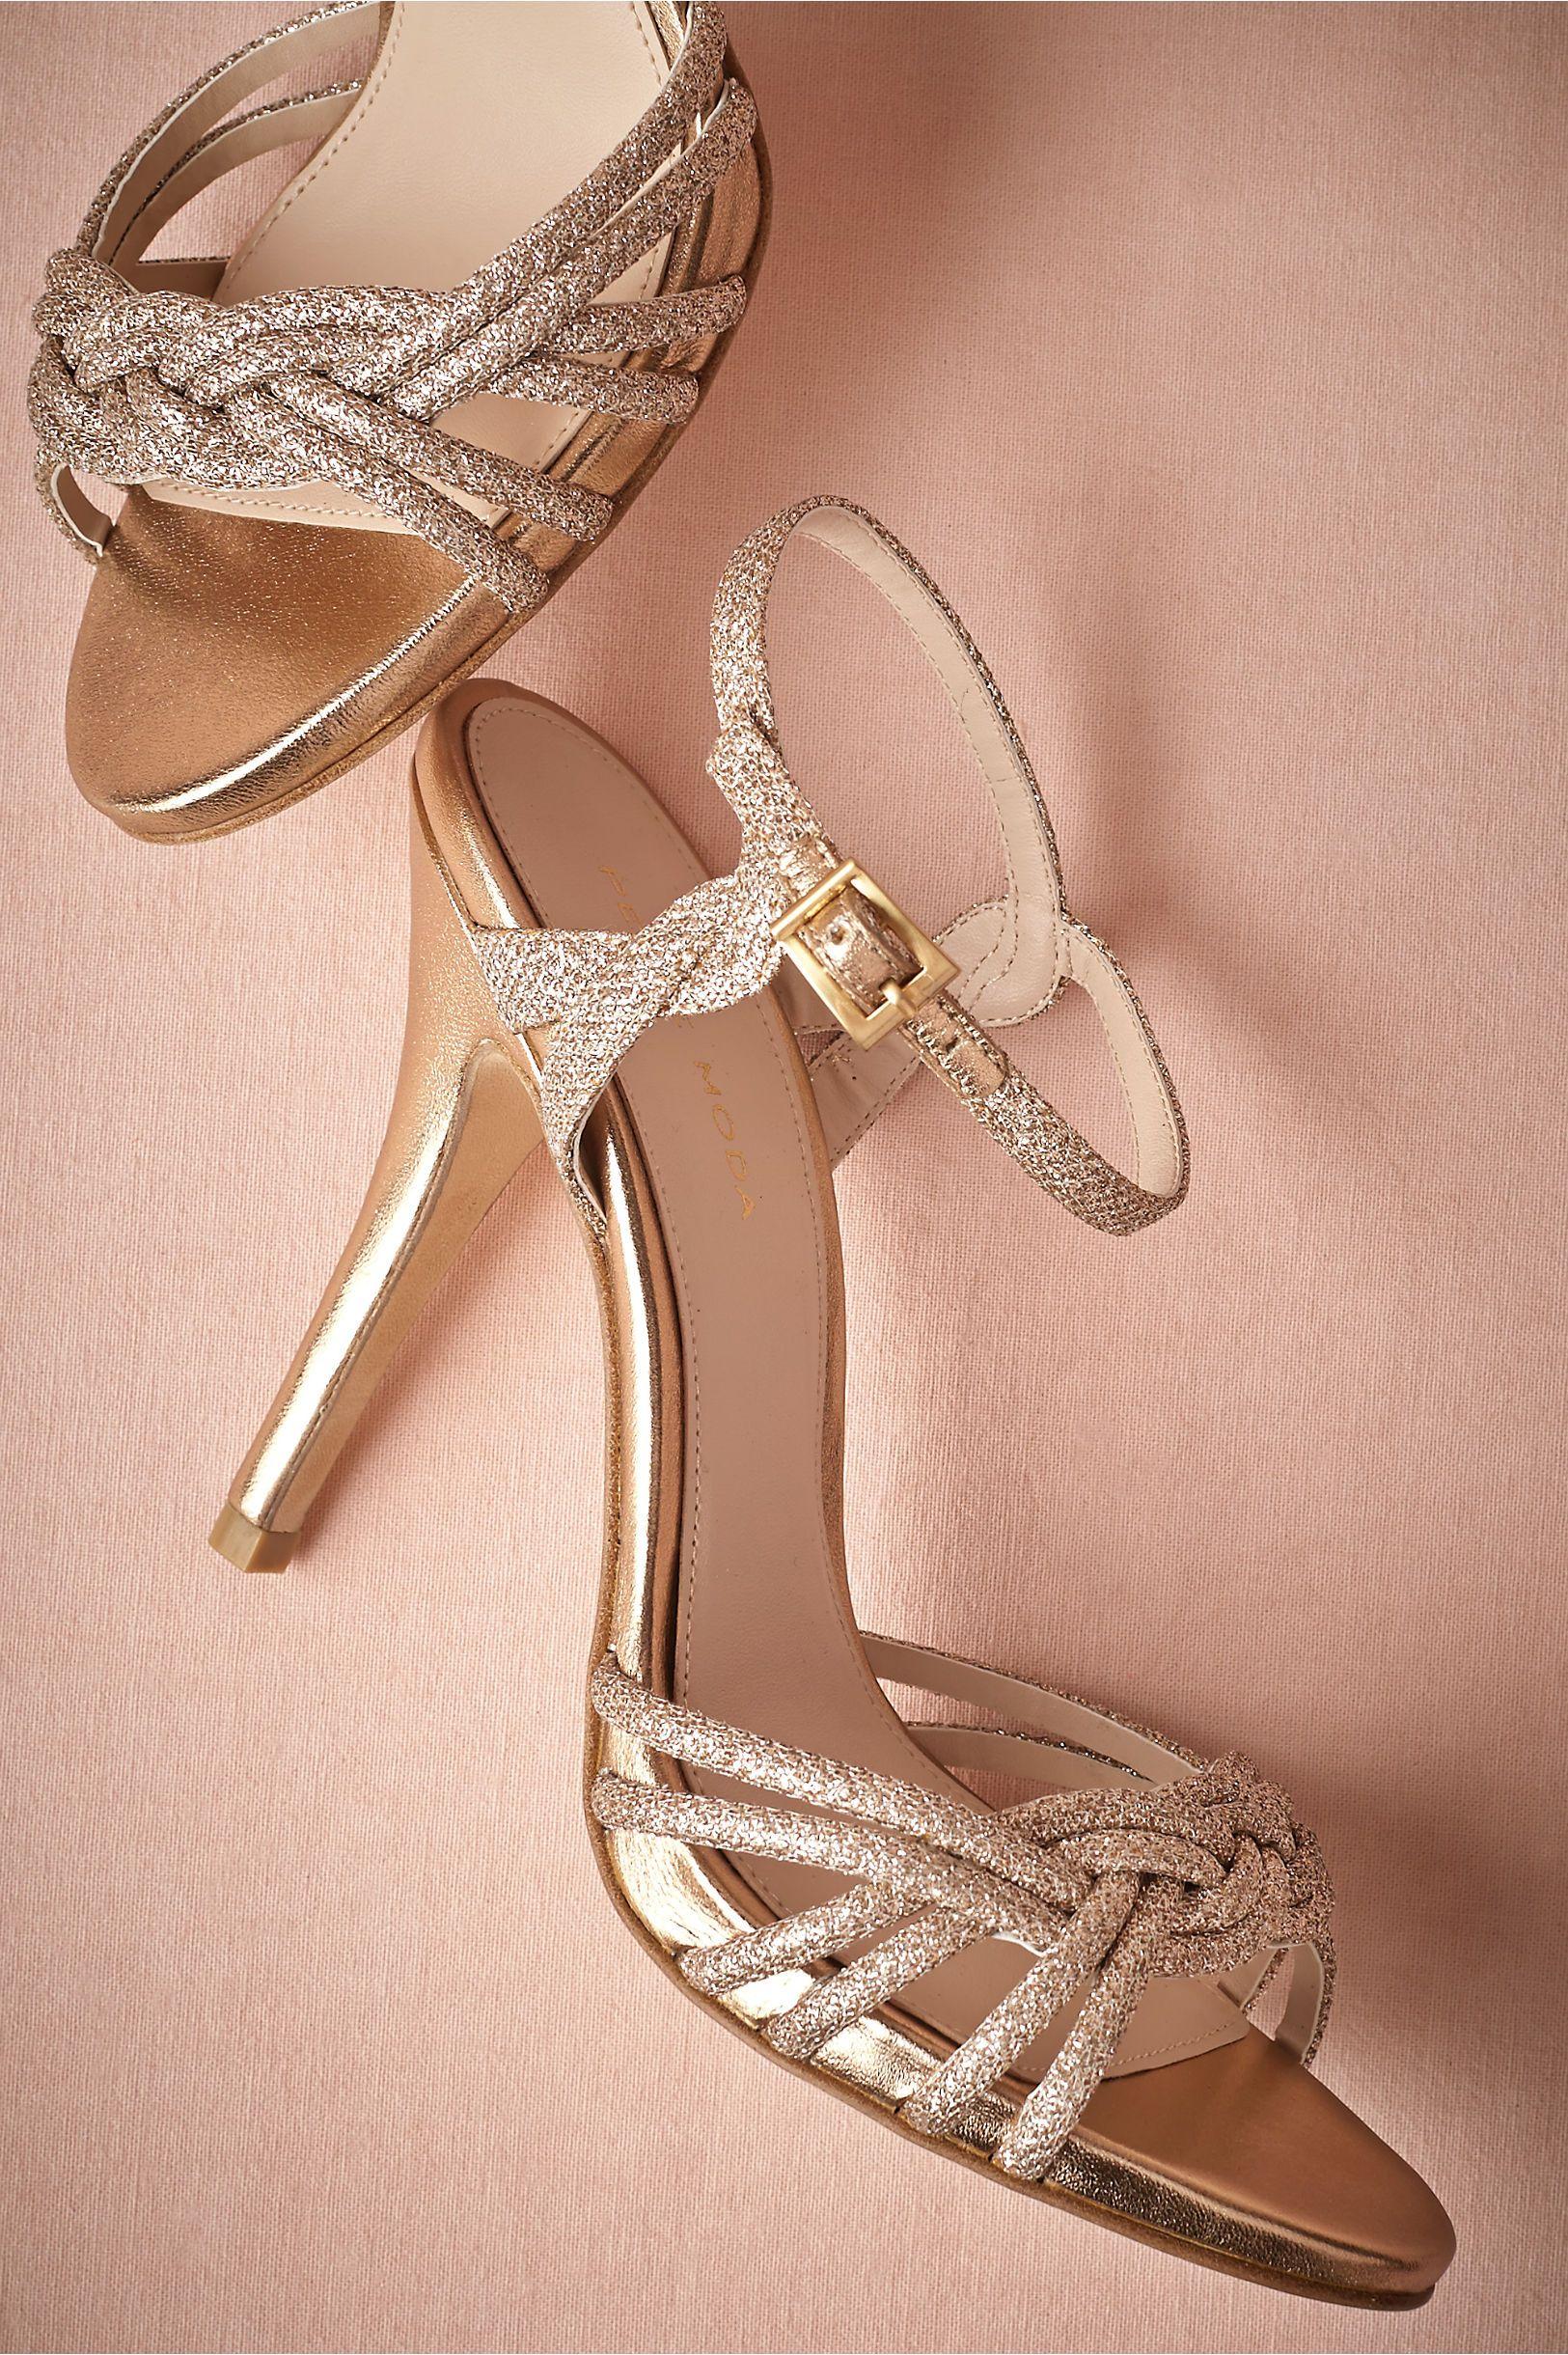 Gold Wedding Shoes: Bridesmaid Shoes